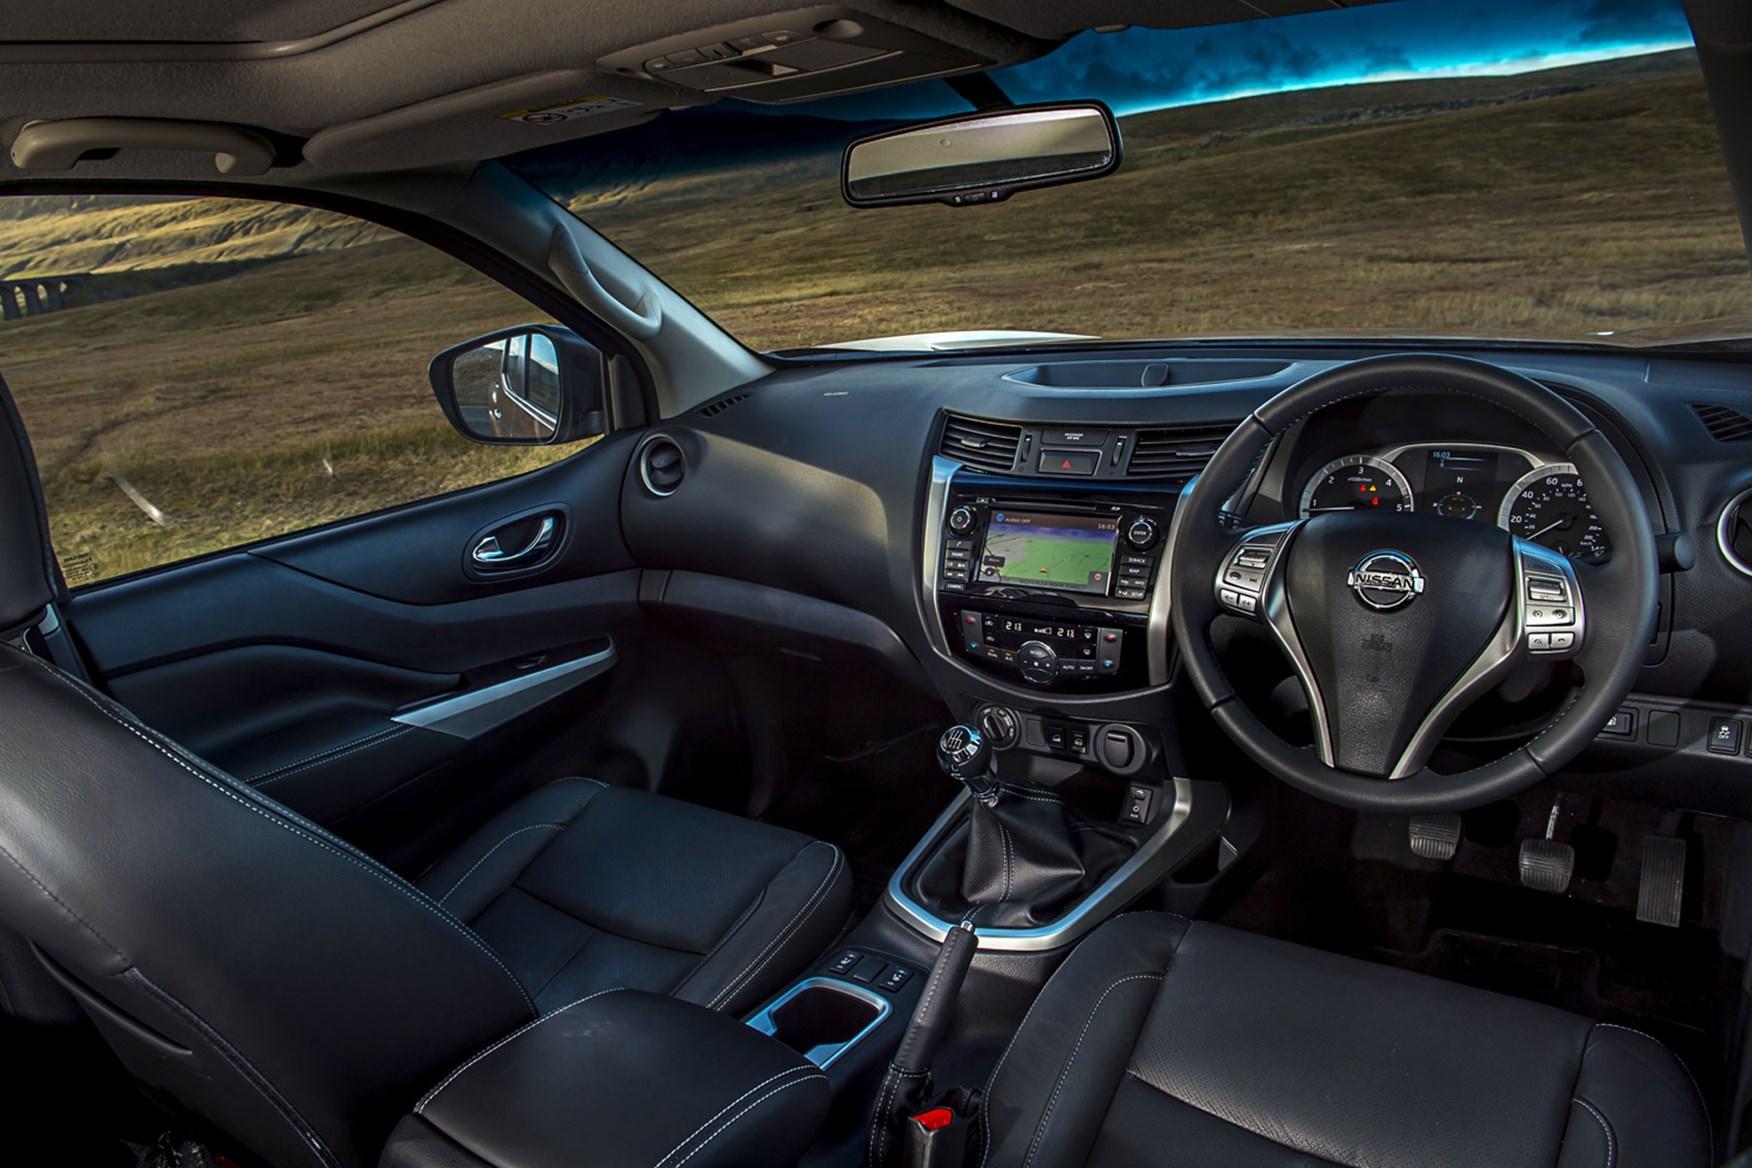 Nissan Navara review - cab interior